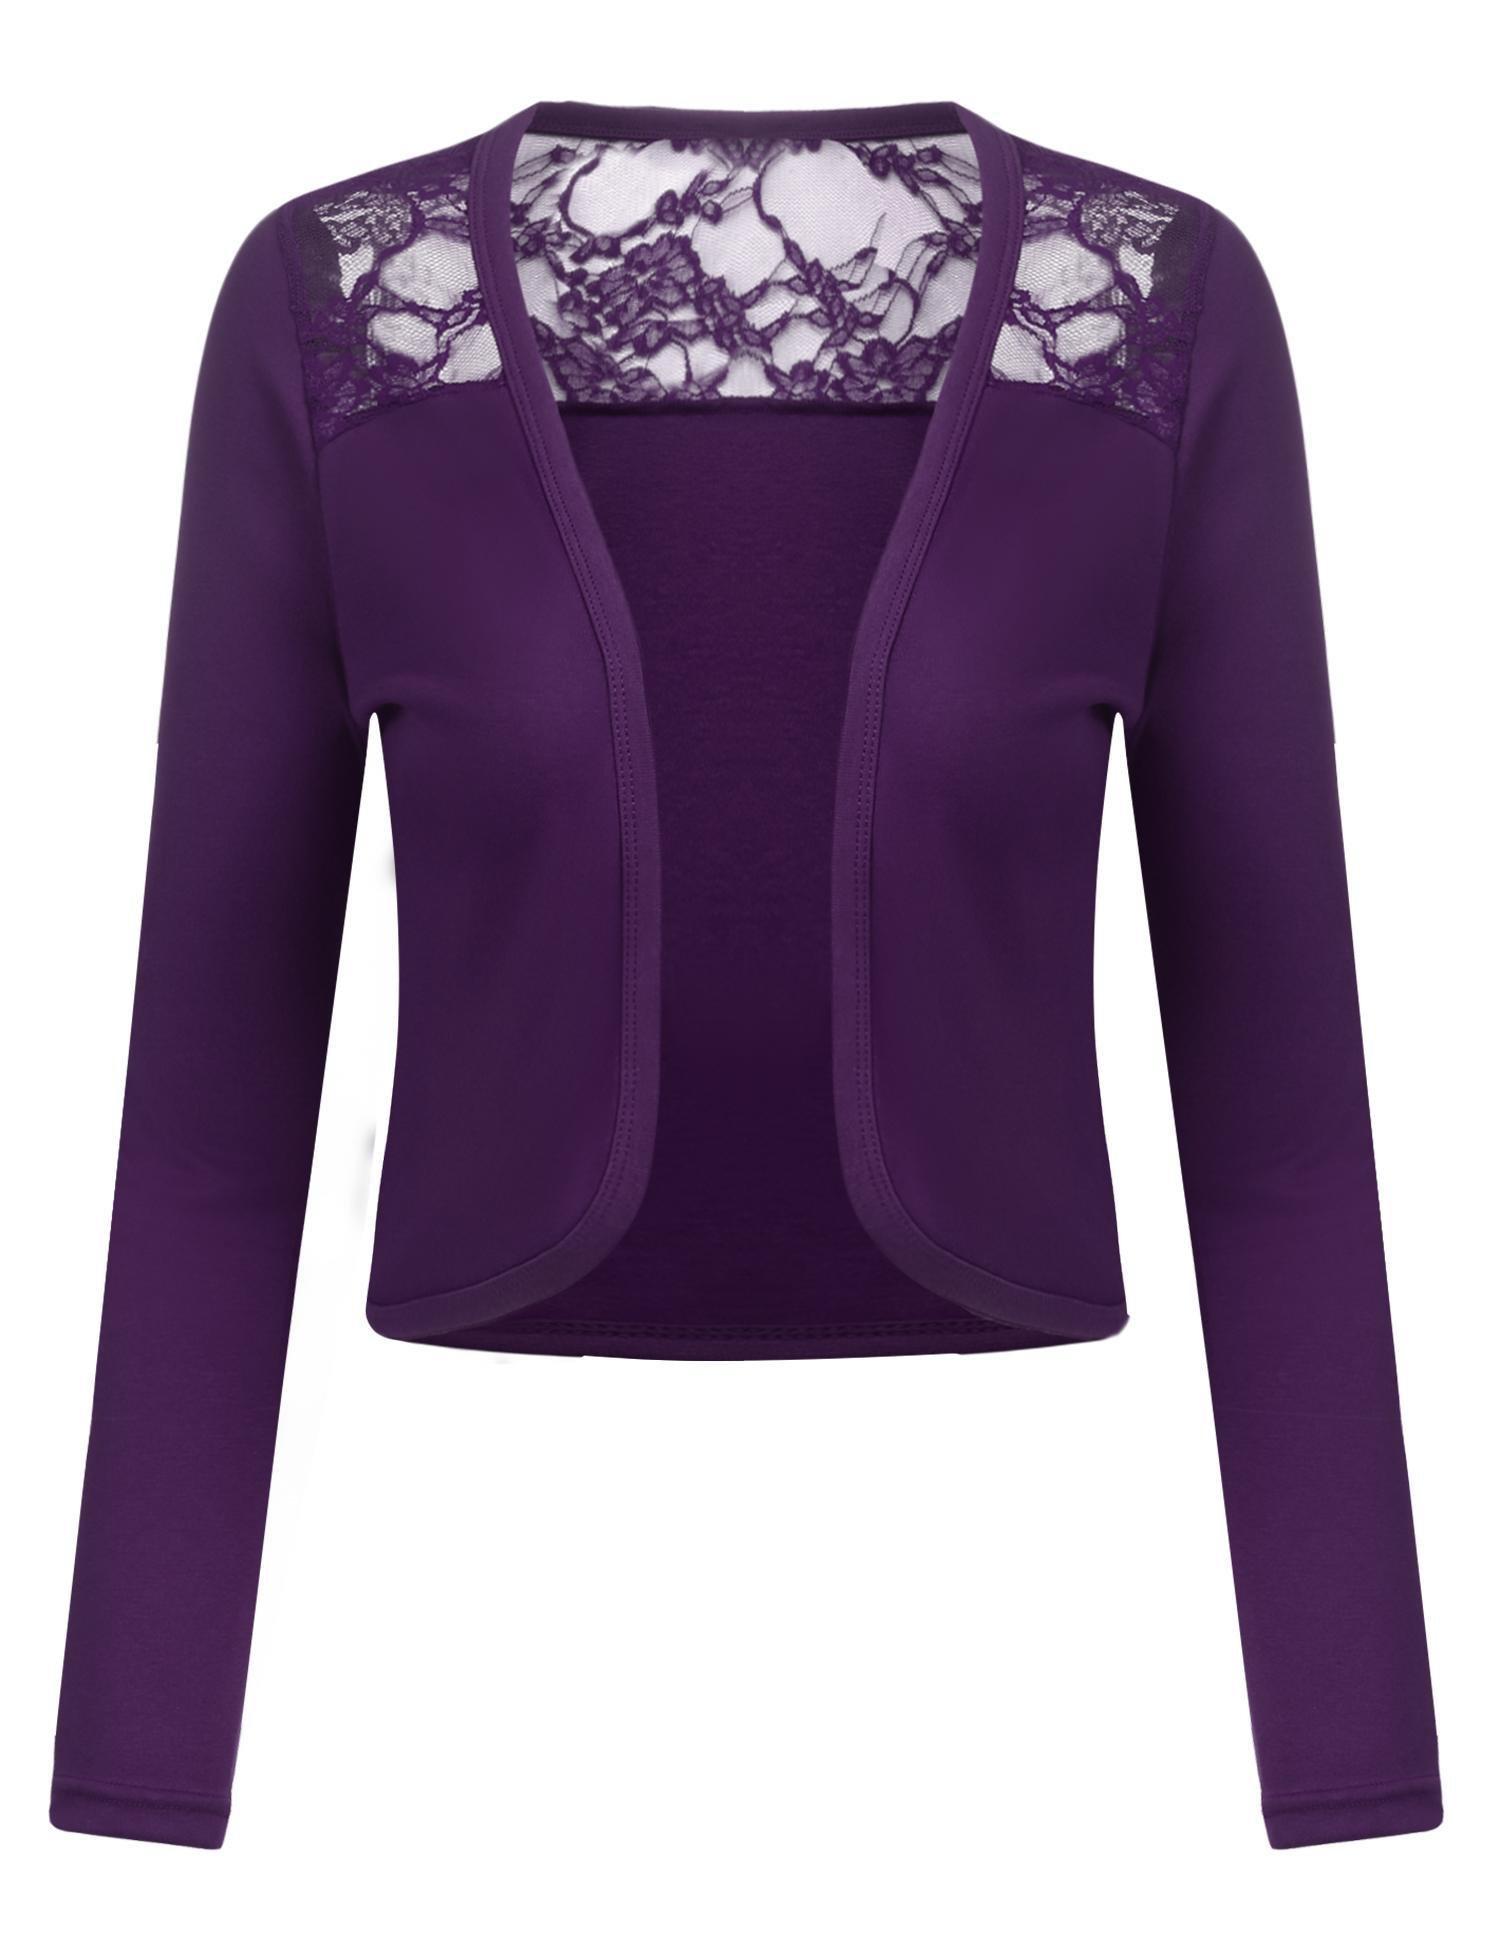 Dealwell Women's Long Sleeve Bolero Shrug Open Front Lace Cropped Cardigan